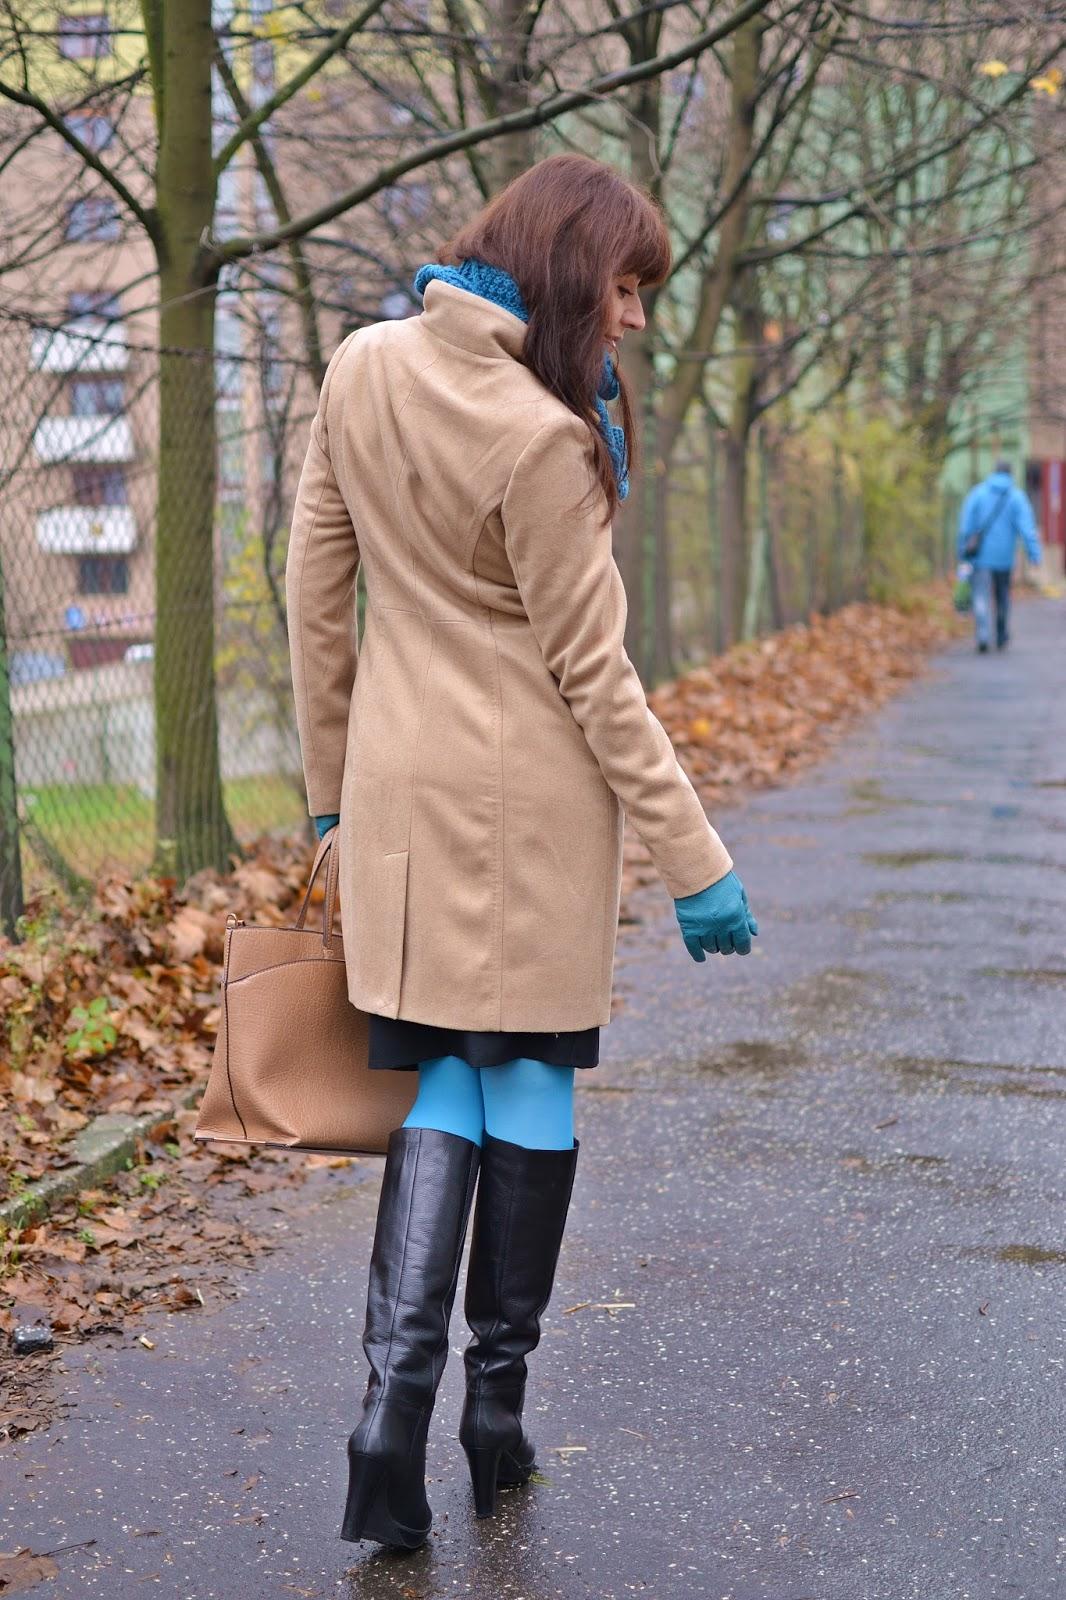 What can I wear today_Katharine-fashion is beautiful_Tyrkysové kožené rukavice_Tyrkysové pančuchy_Béžový kabát_Čierna pencil sukňa_Katarína Jakubčová_Fashion blogger